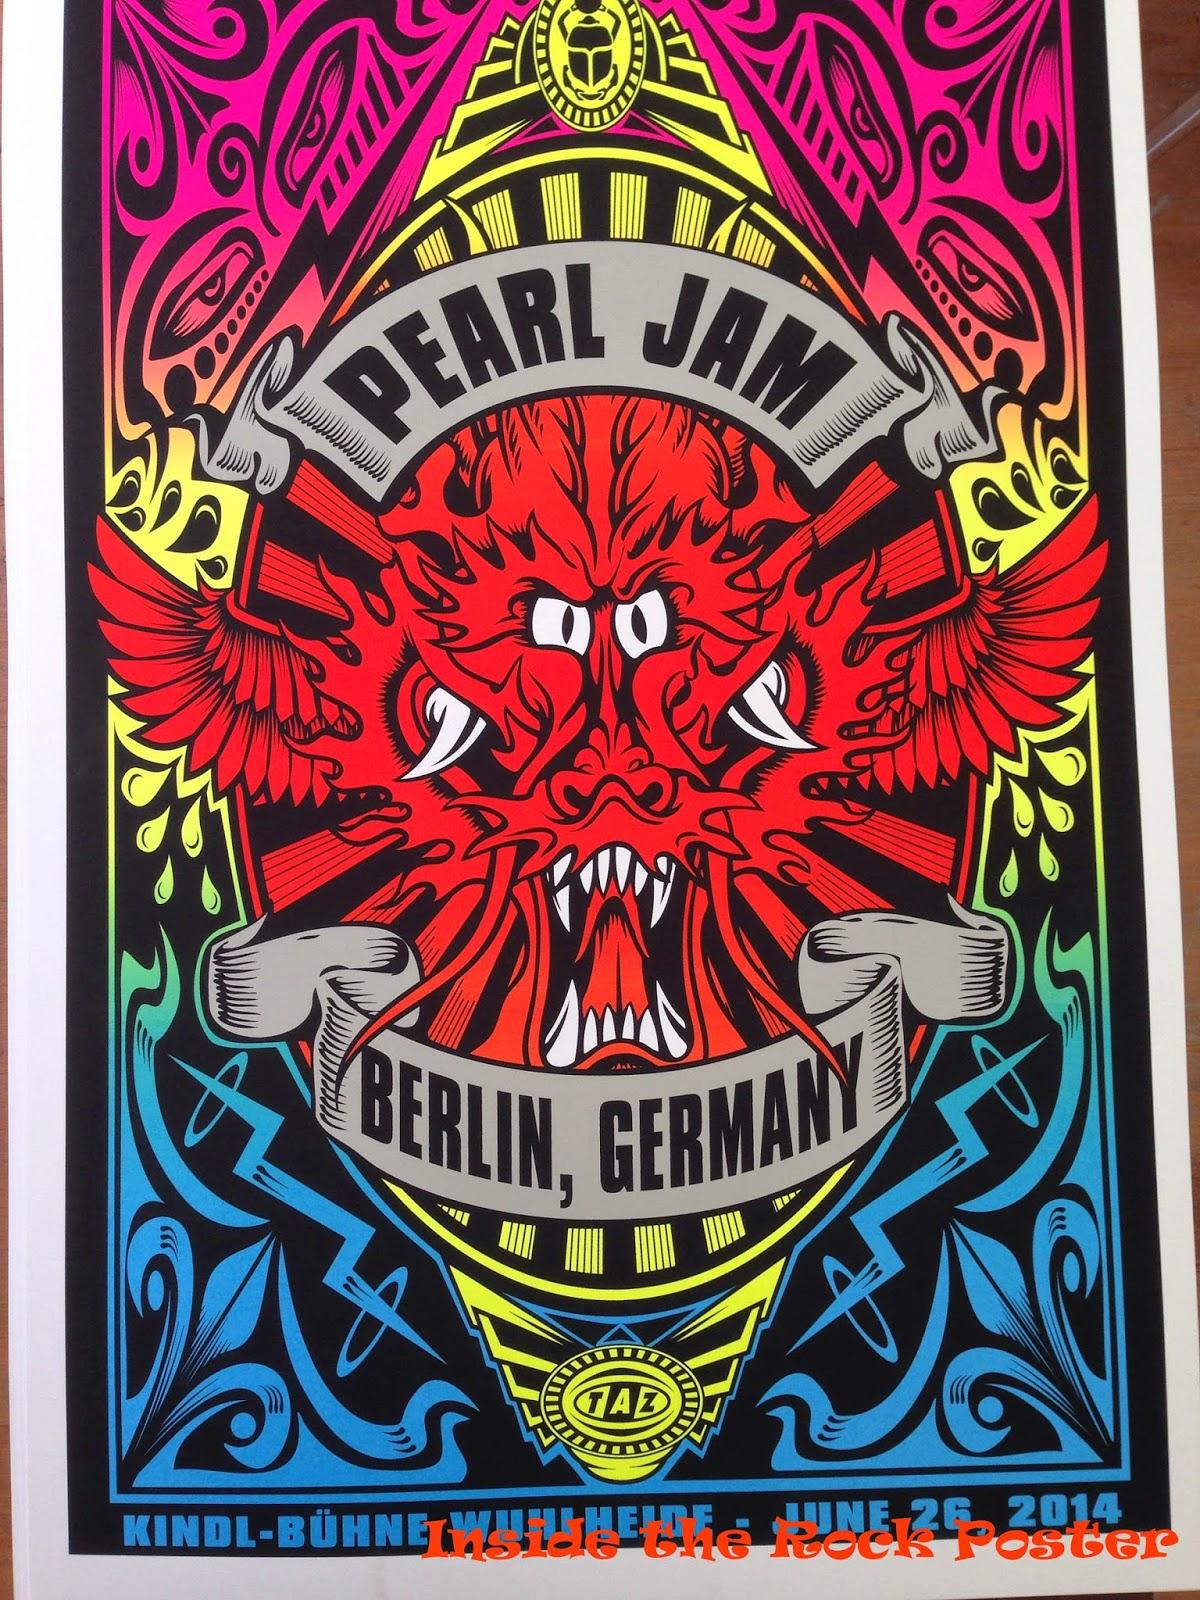 Pearl Jam lyrics - song lyrics sorted by album, including